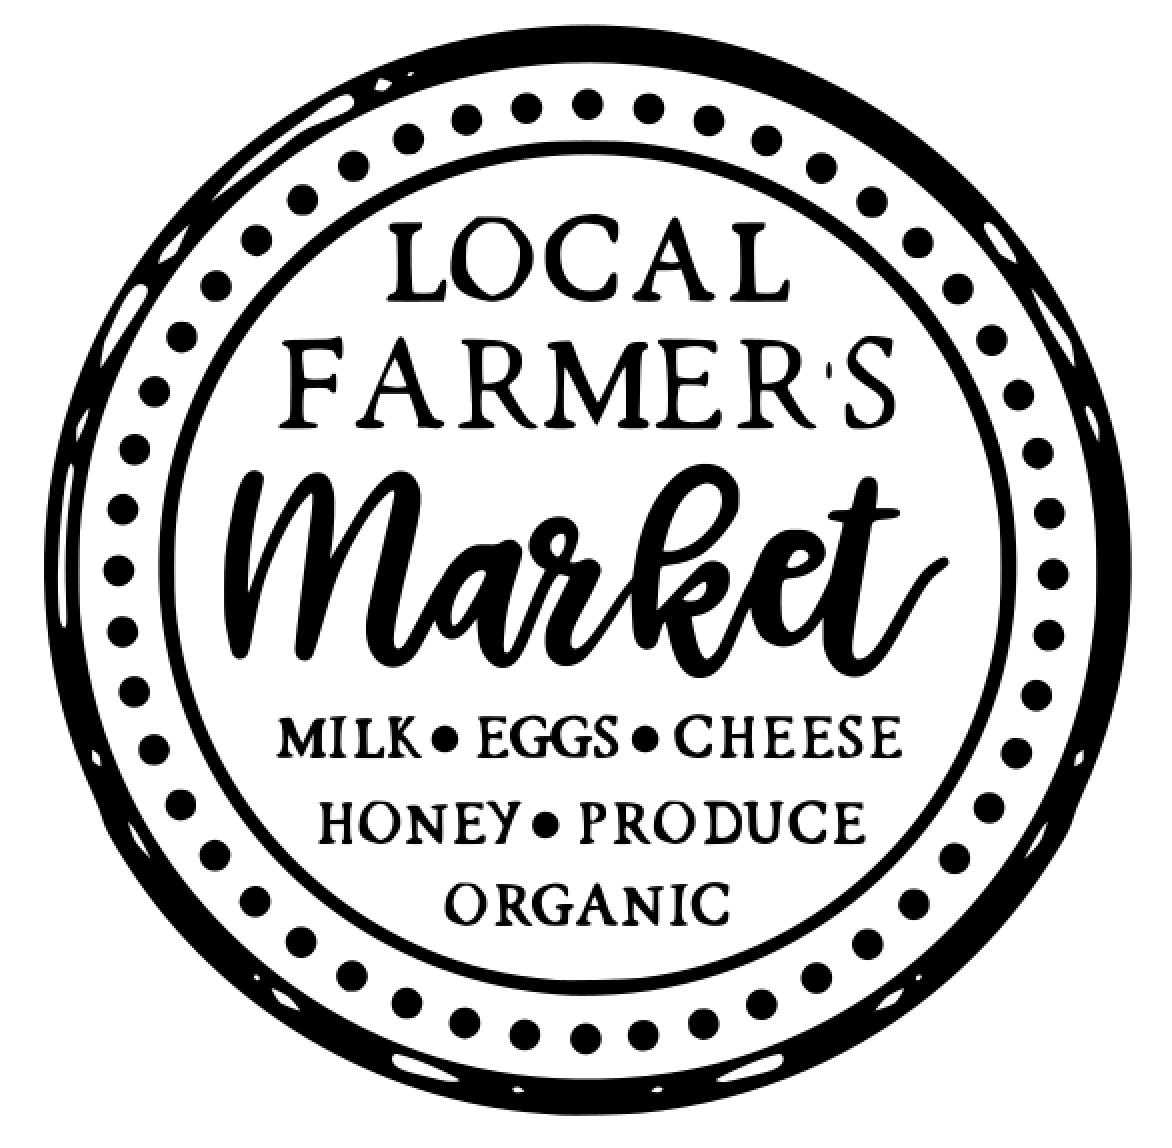 23 Local farmers market